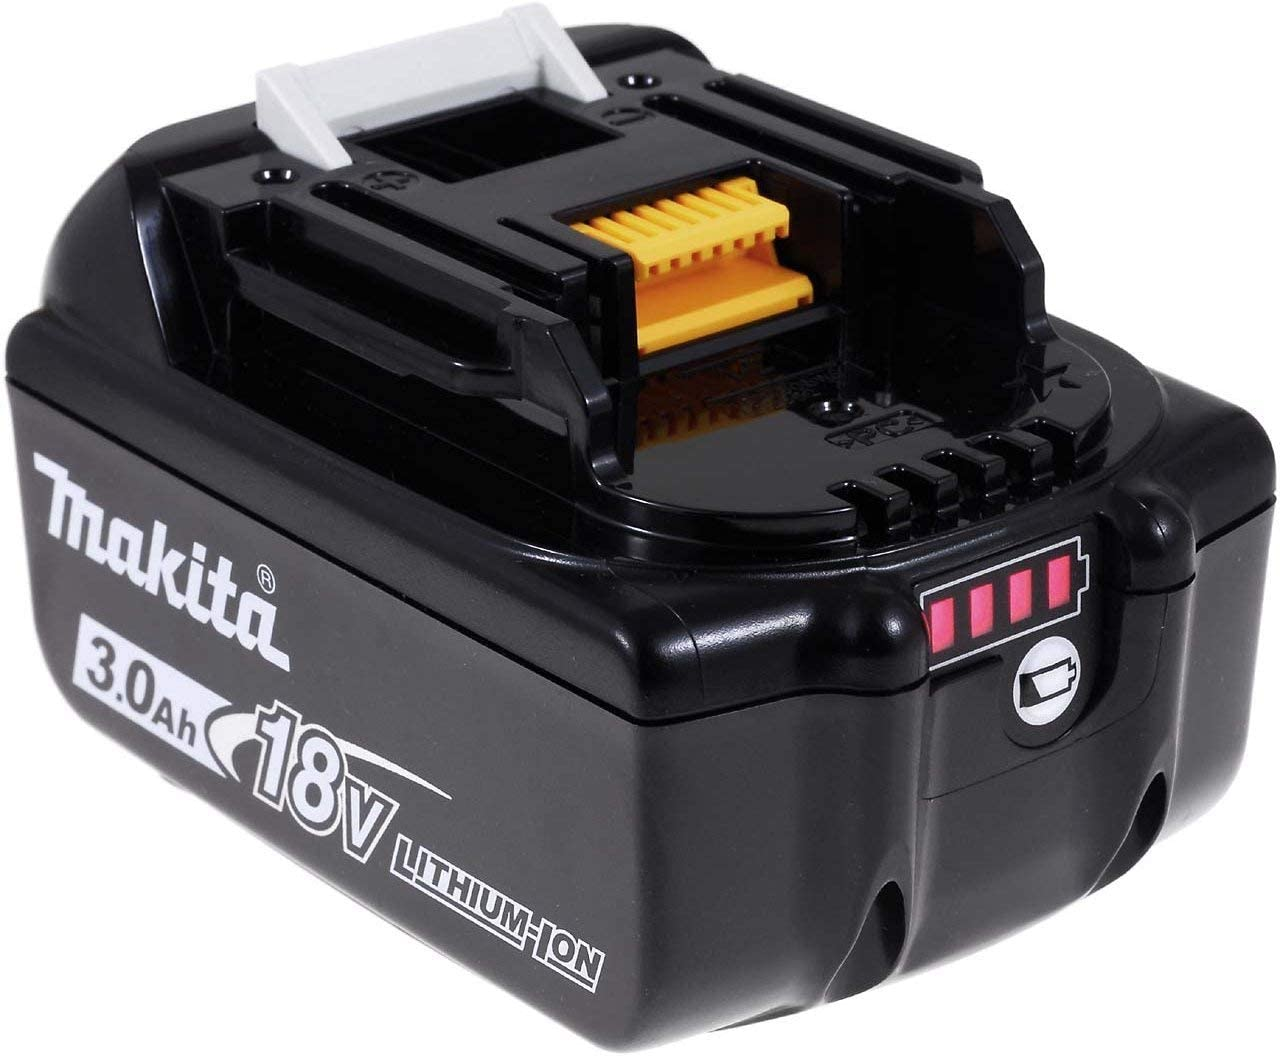 Batería para Herramienta Makita modelo BL1830 3000mAh Original